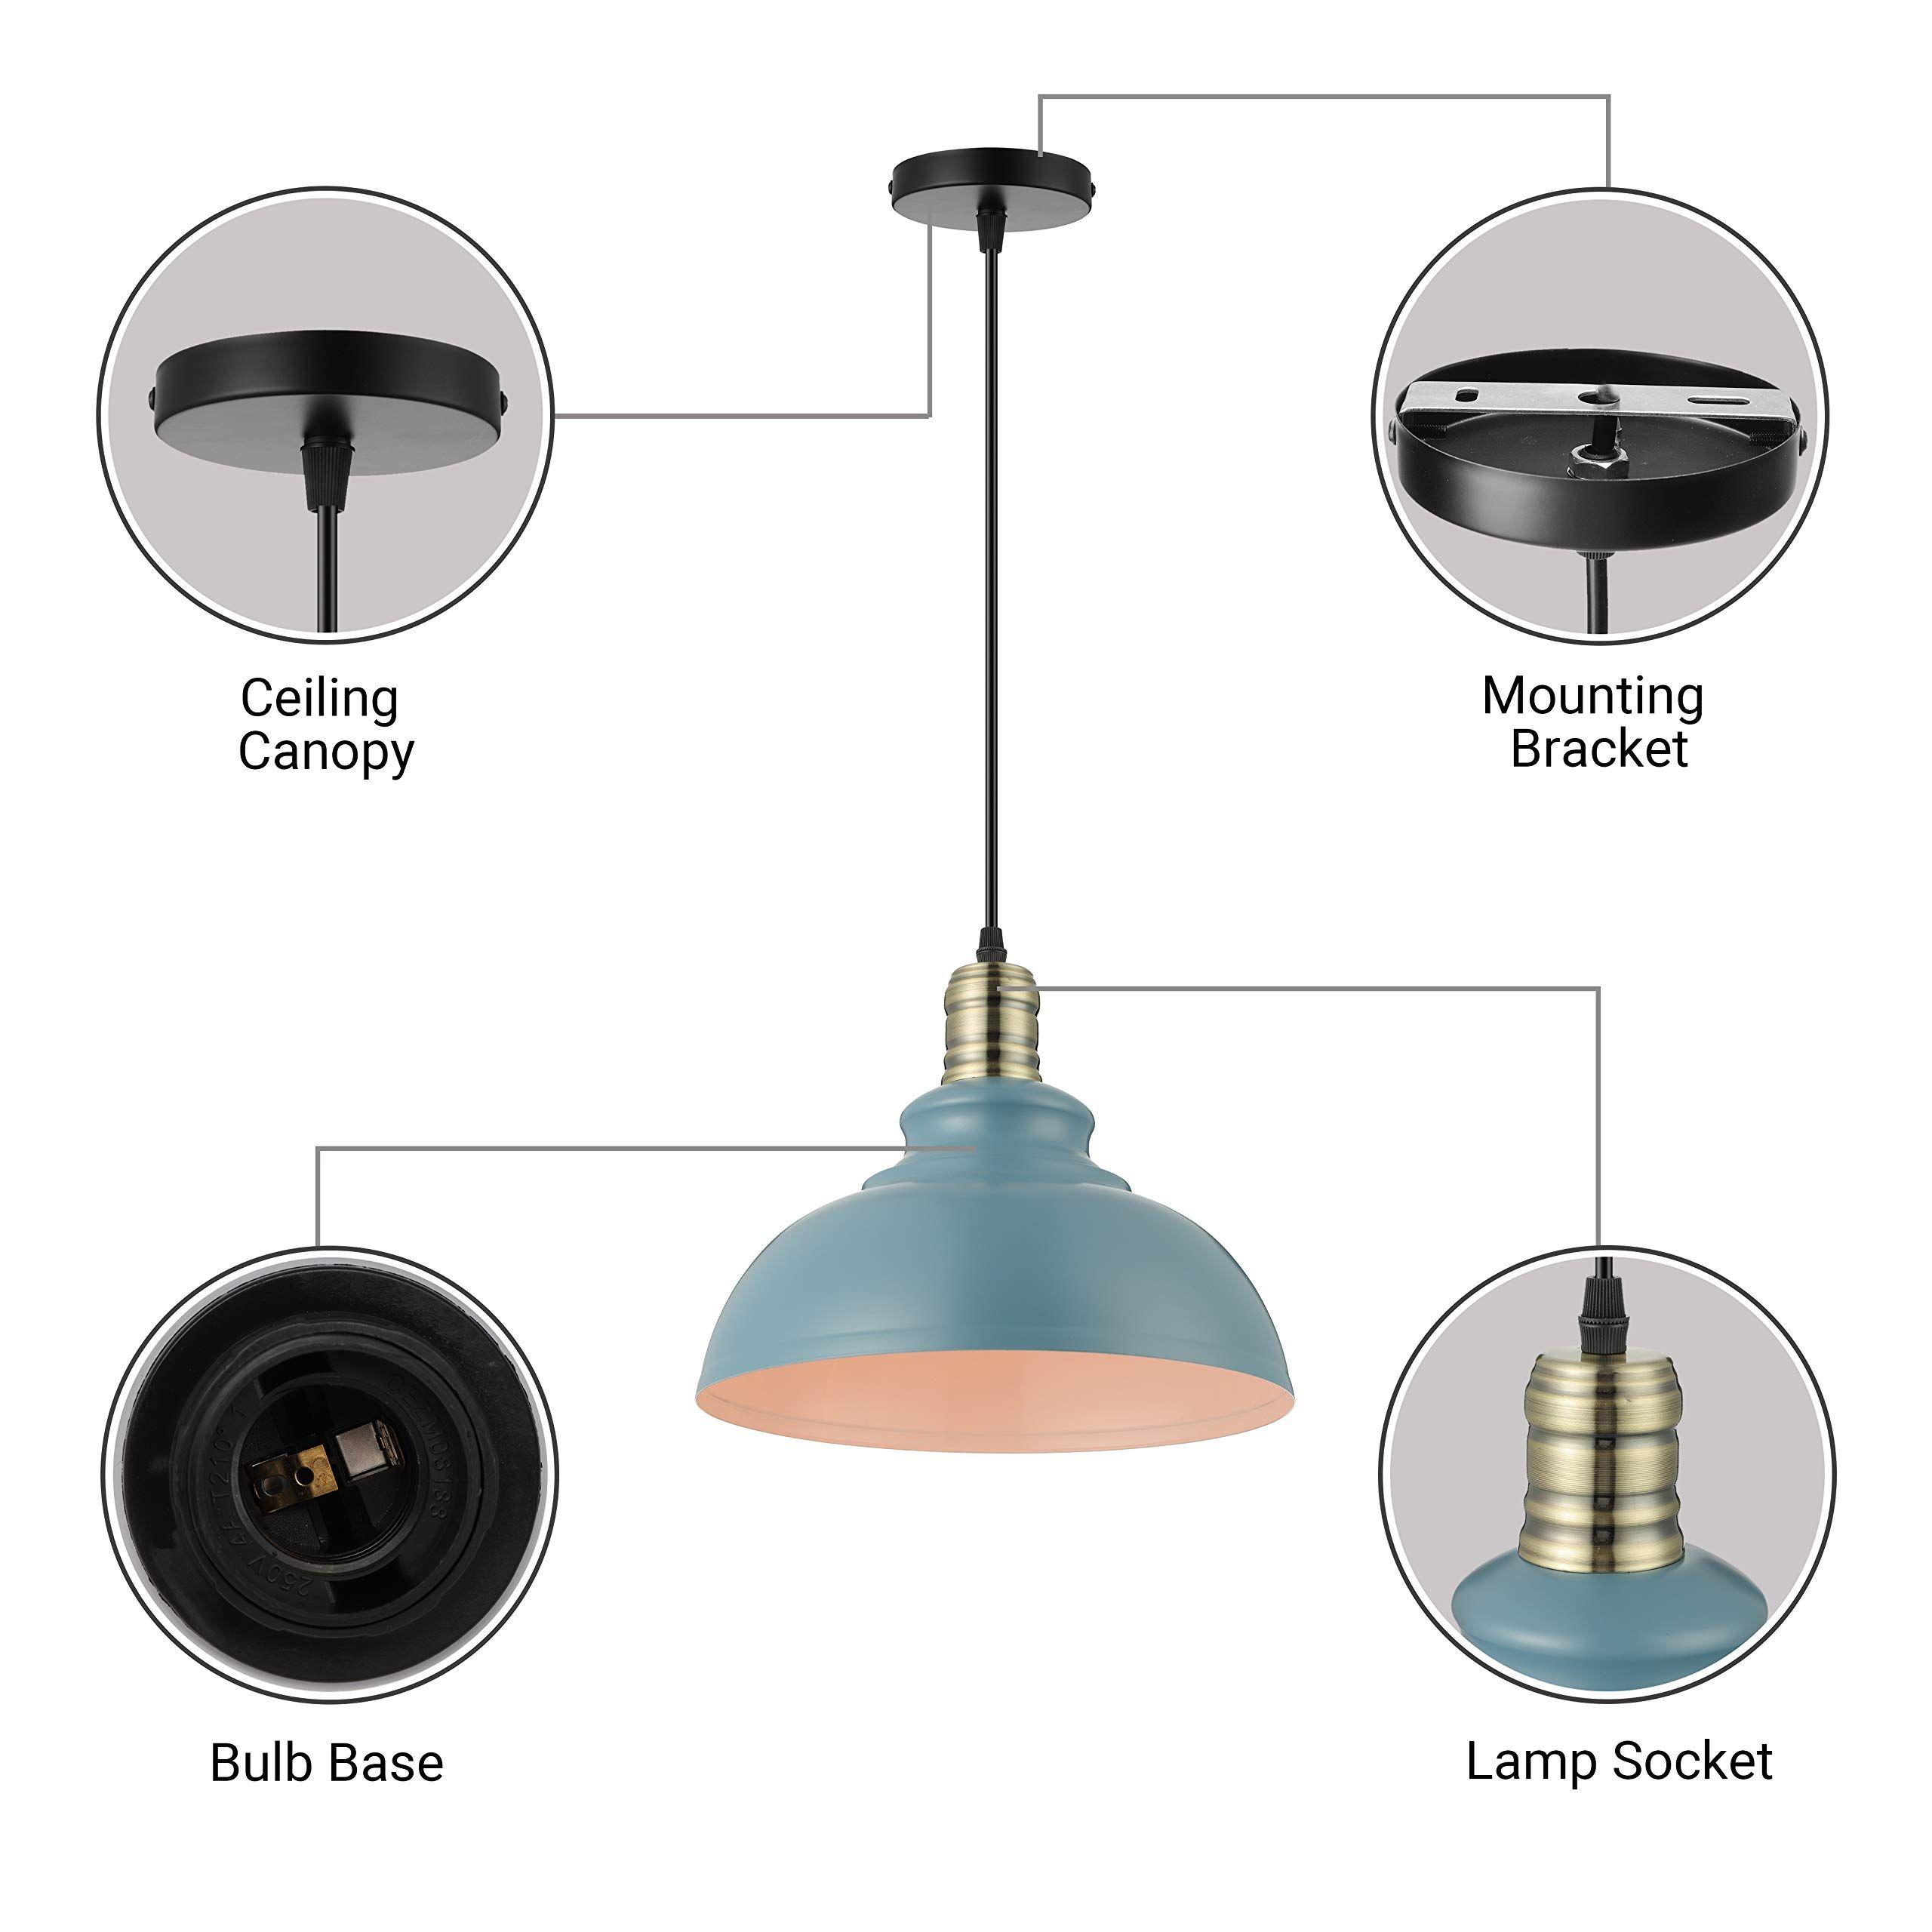 Kwoking Lighting Industrial Barn Pendant Light Chandelier Hanging Lamp 11 4 Wide Shade Metal Ceiling Fixture Fo In 2020 Metal Ceiling Lamp Pendant Lights Chandeliers